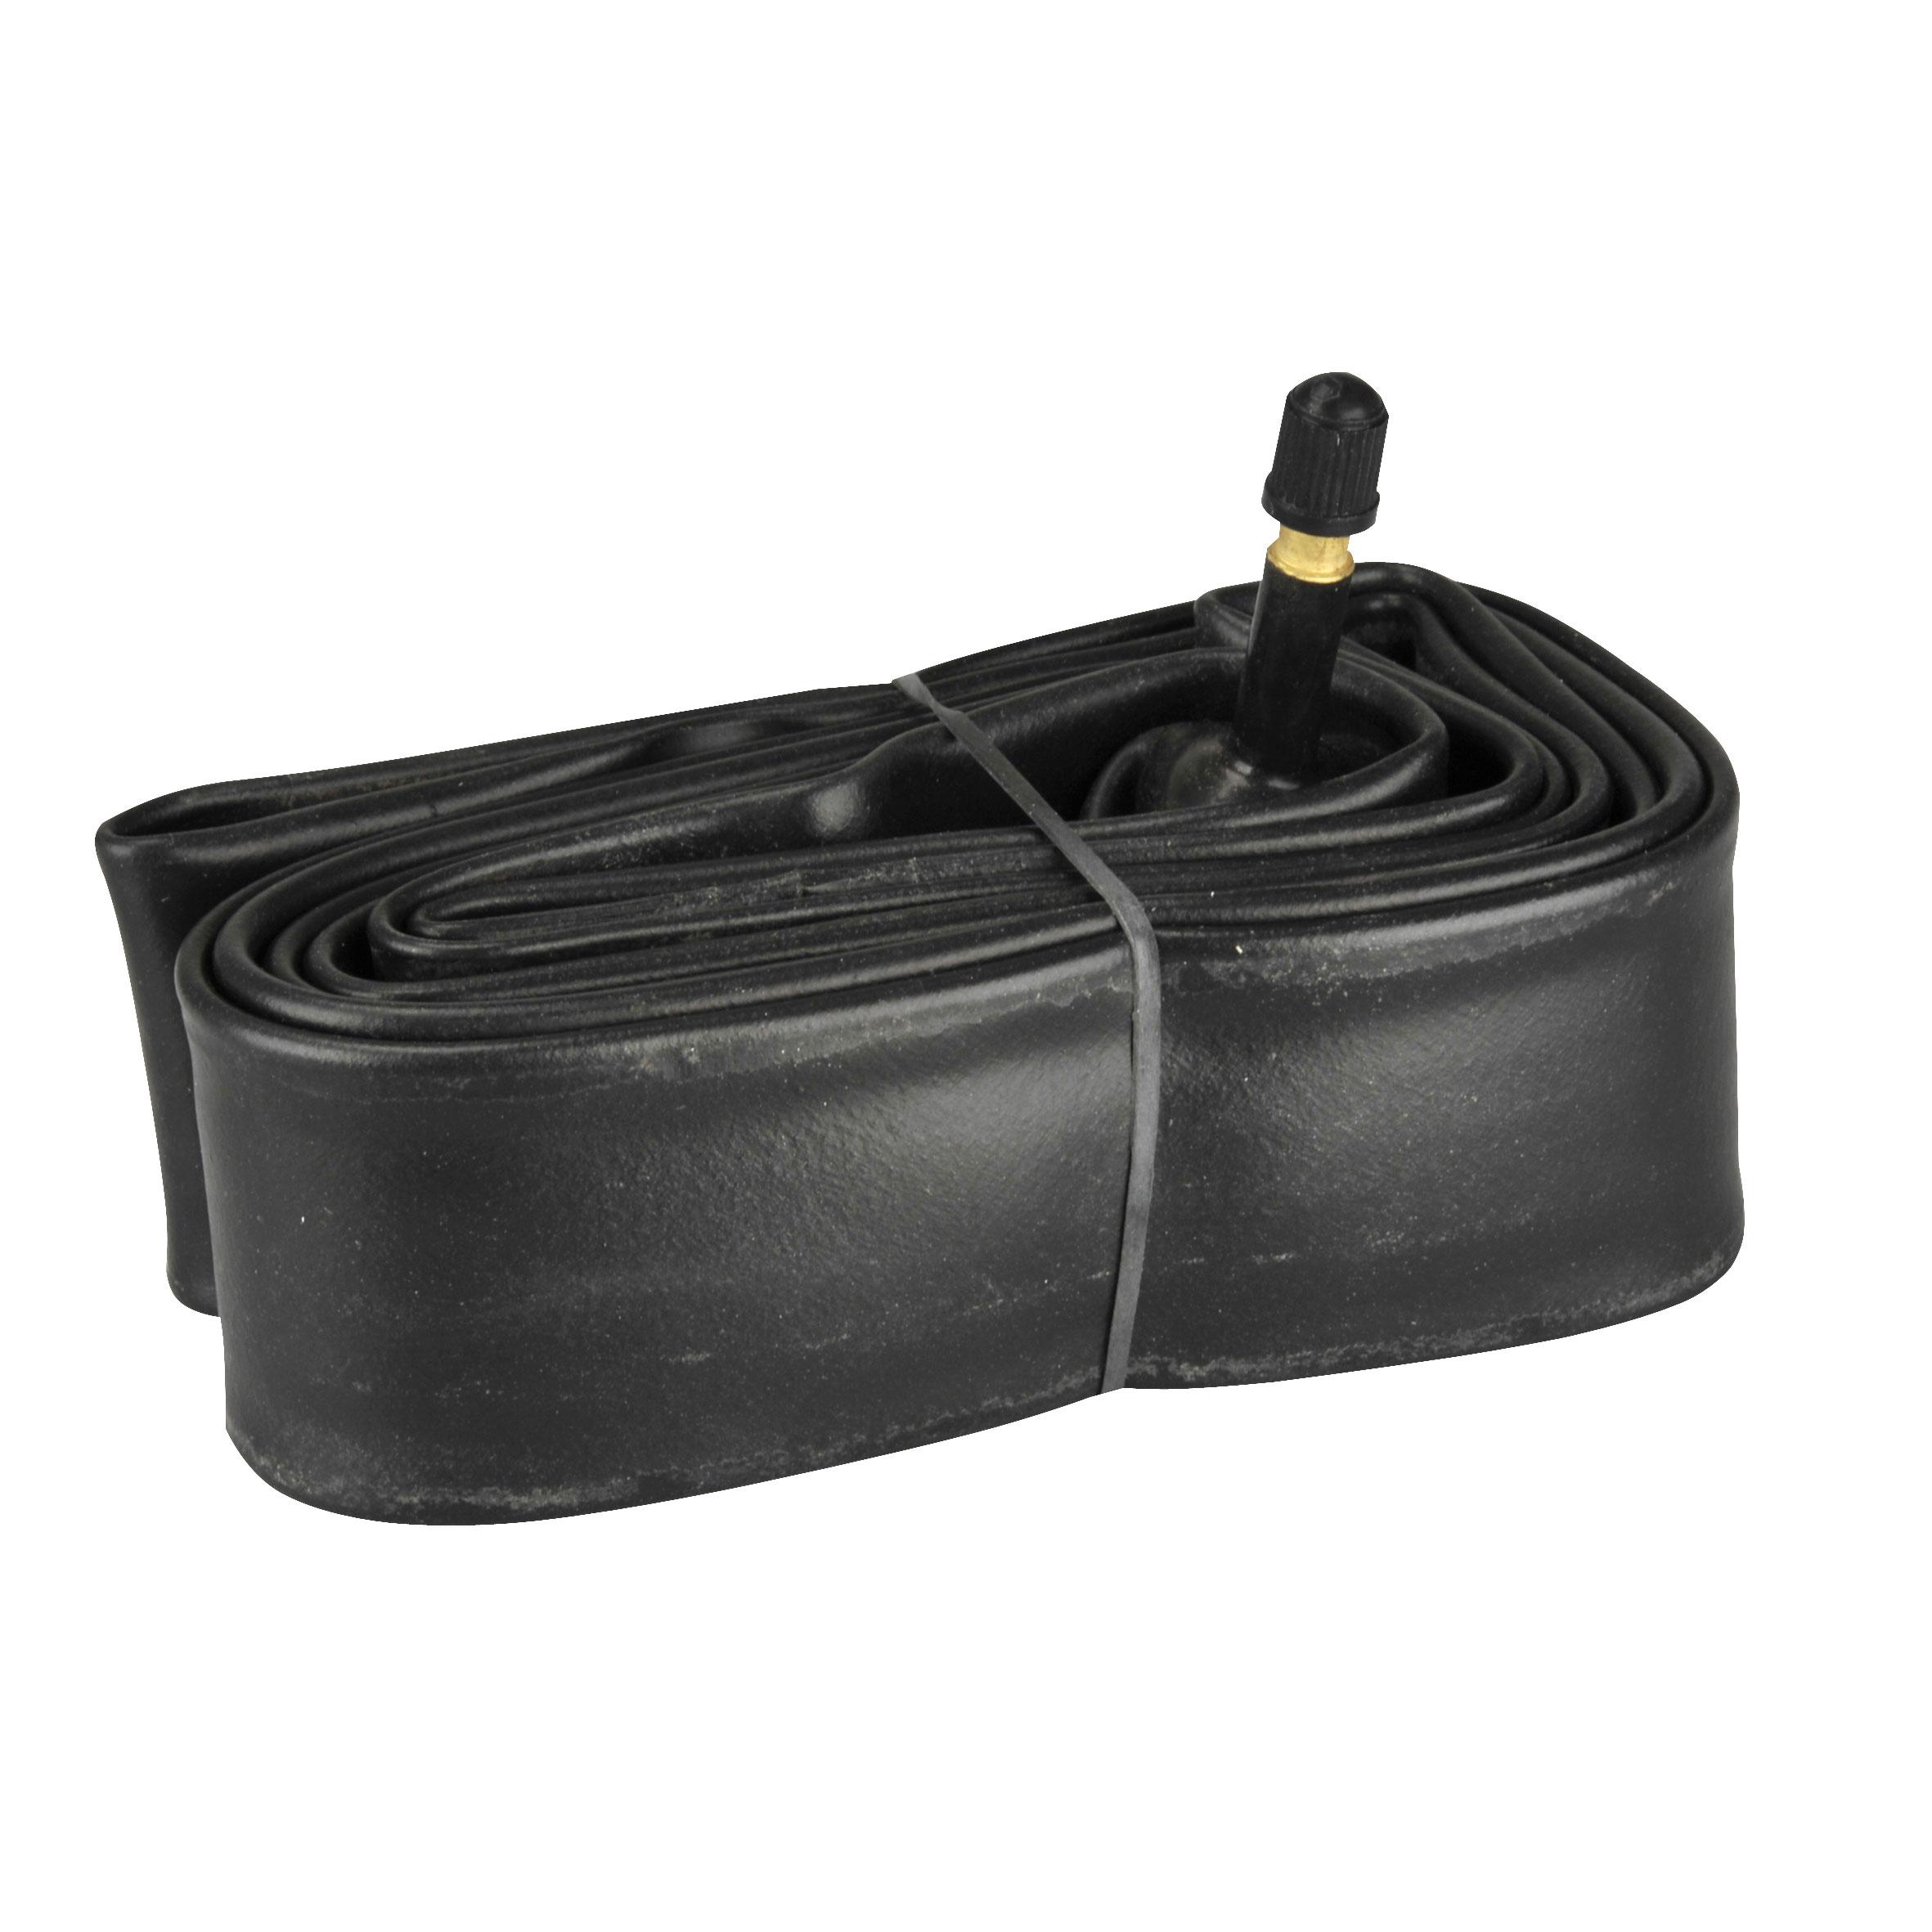 fischer fahrrad schlauch pannenstopp auto ventil 28x1 9. Black Bedroom Furniture Sets. Home Design Ideas